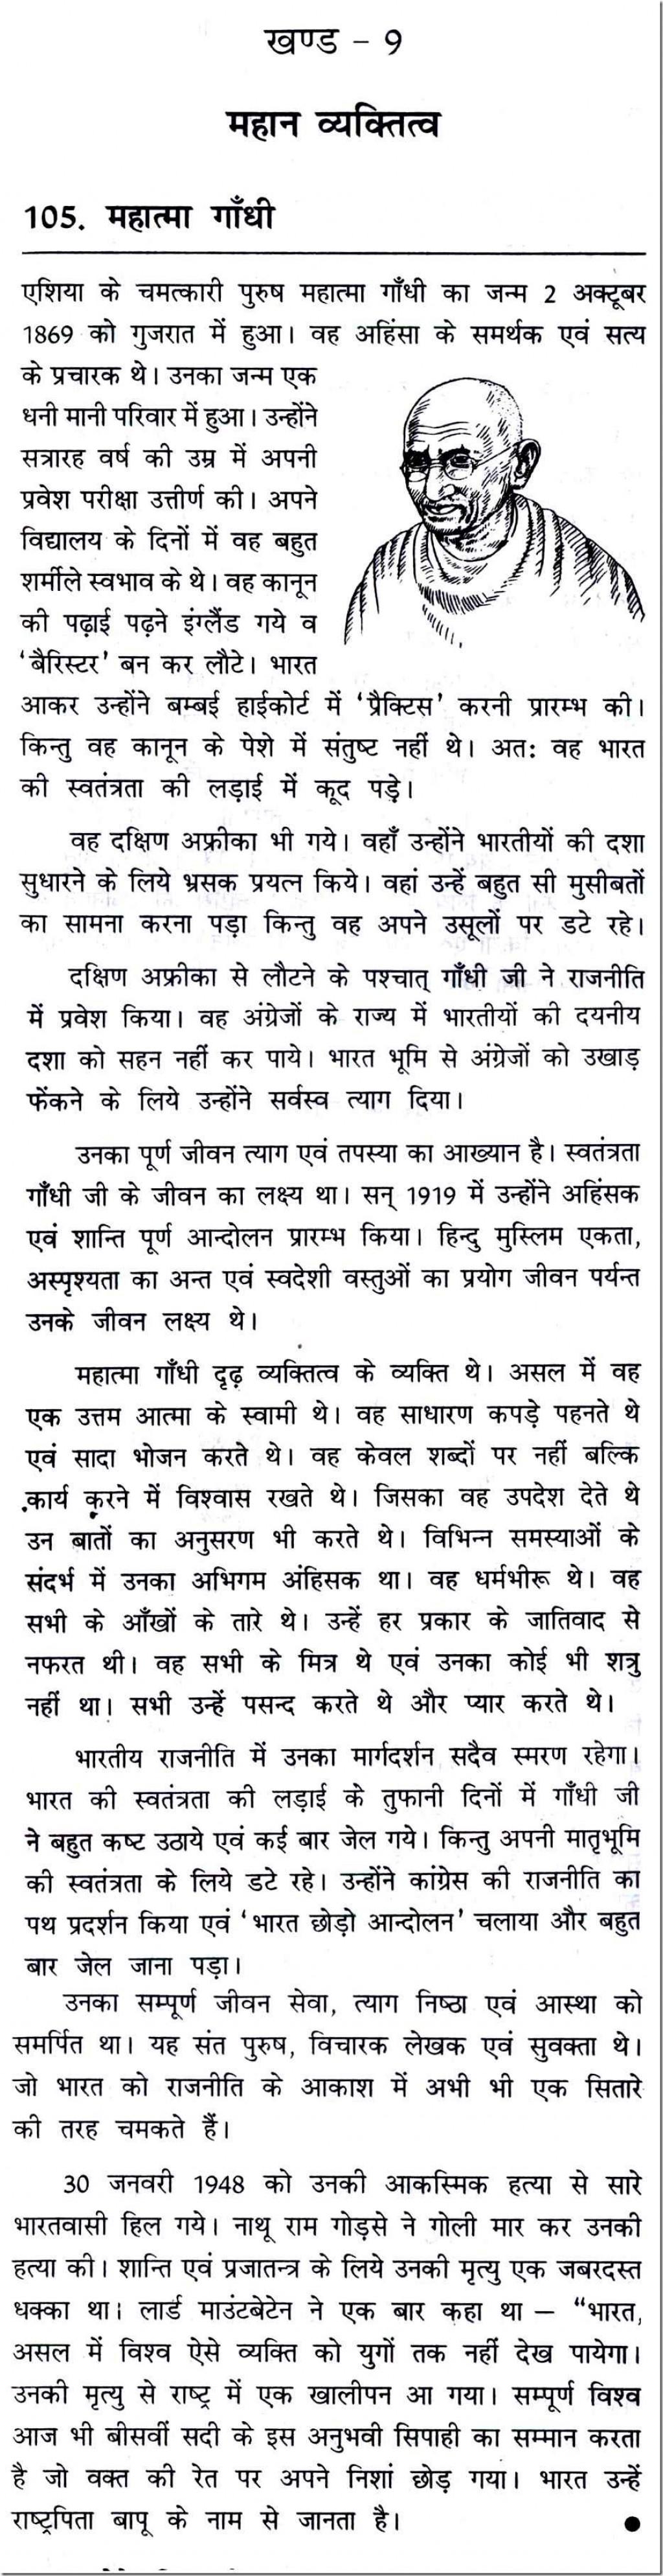 004 Gandhiji Essay 10107 Thumb Sensational Mahatma Gandhi In Gujarati Pdf Free Download Hindi Language Ma Nibandh Large